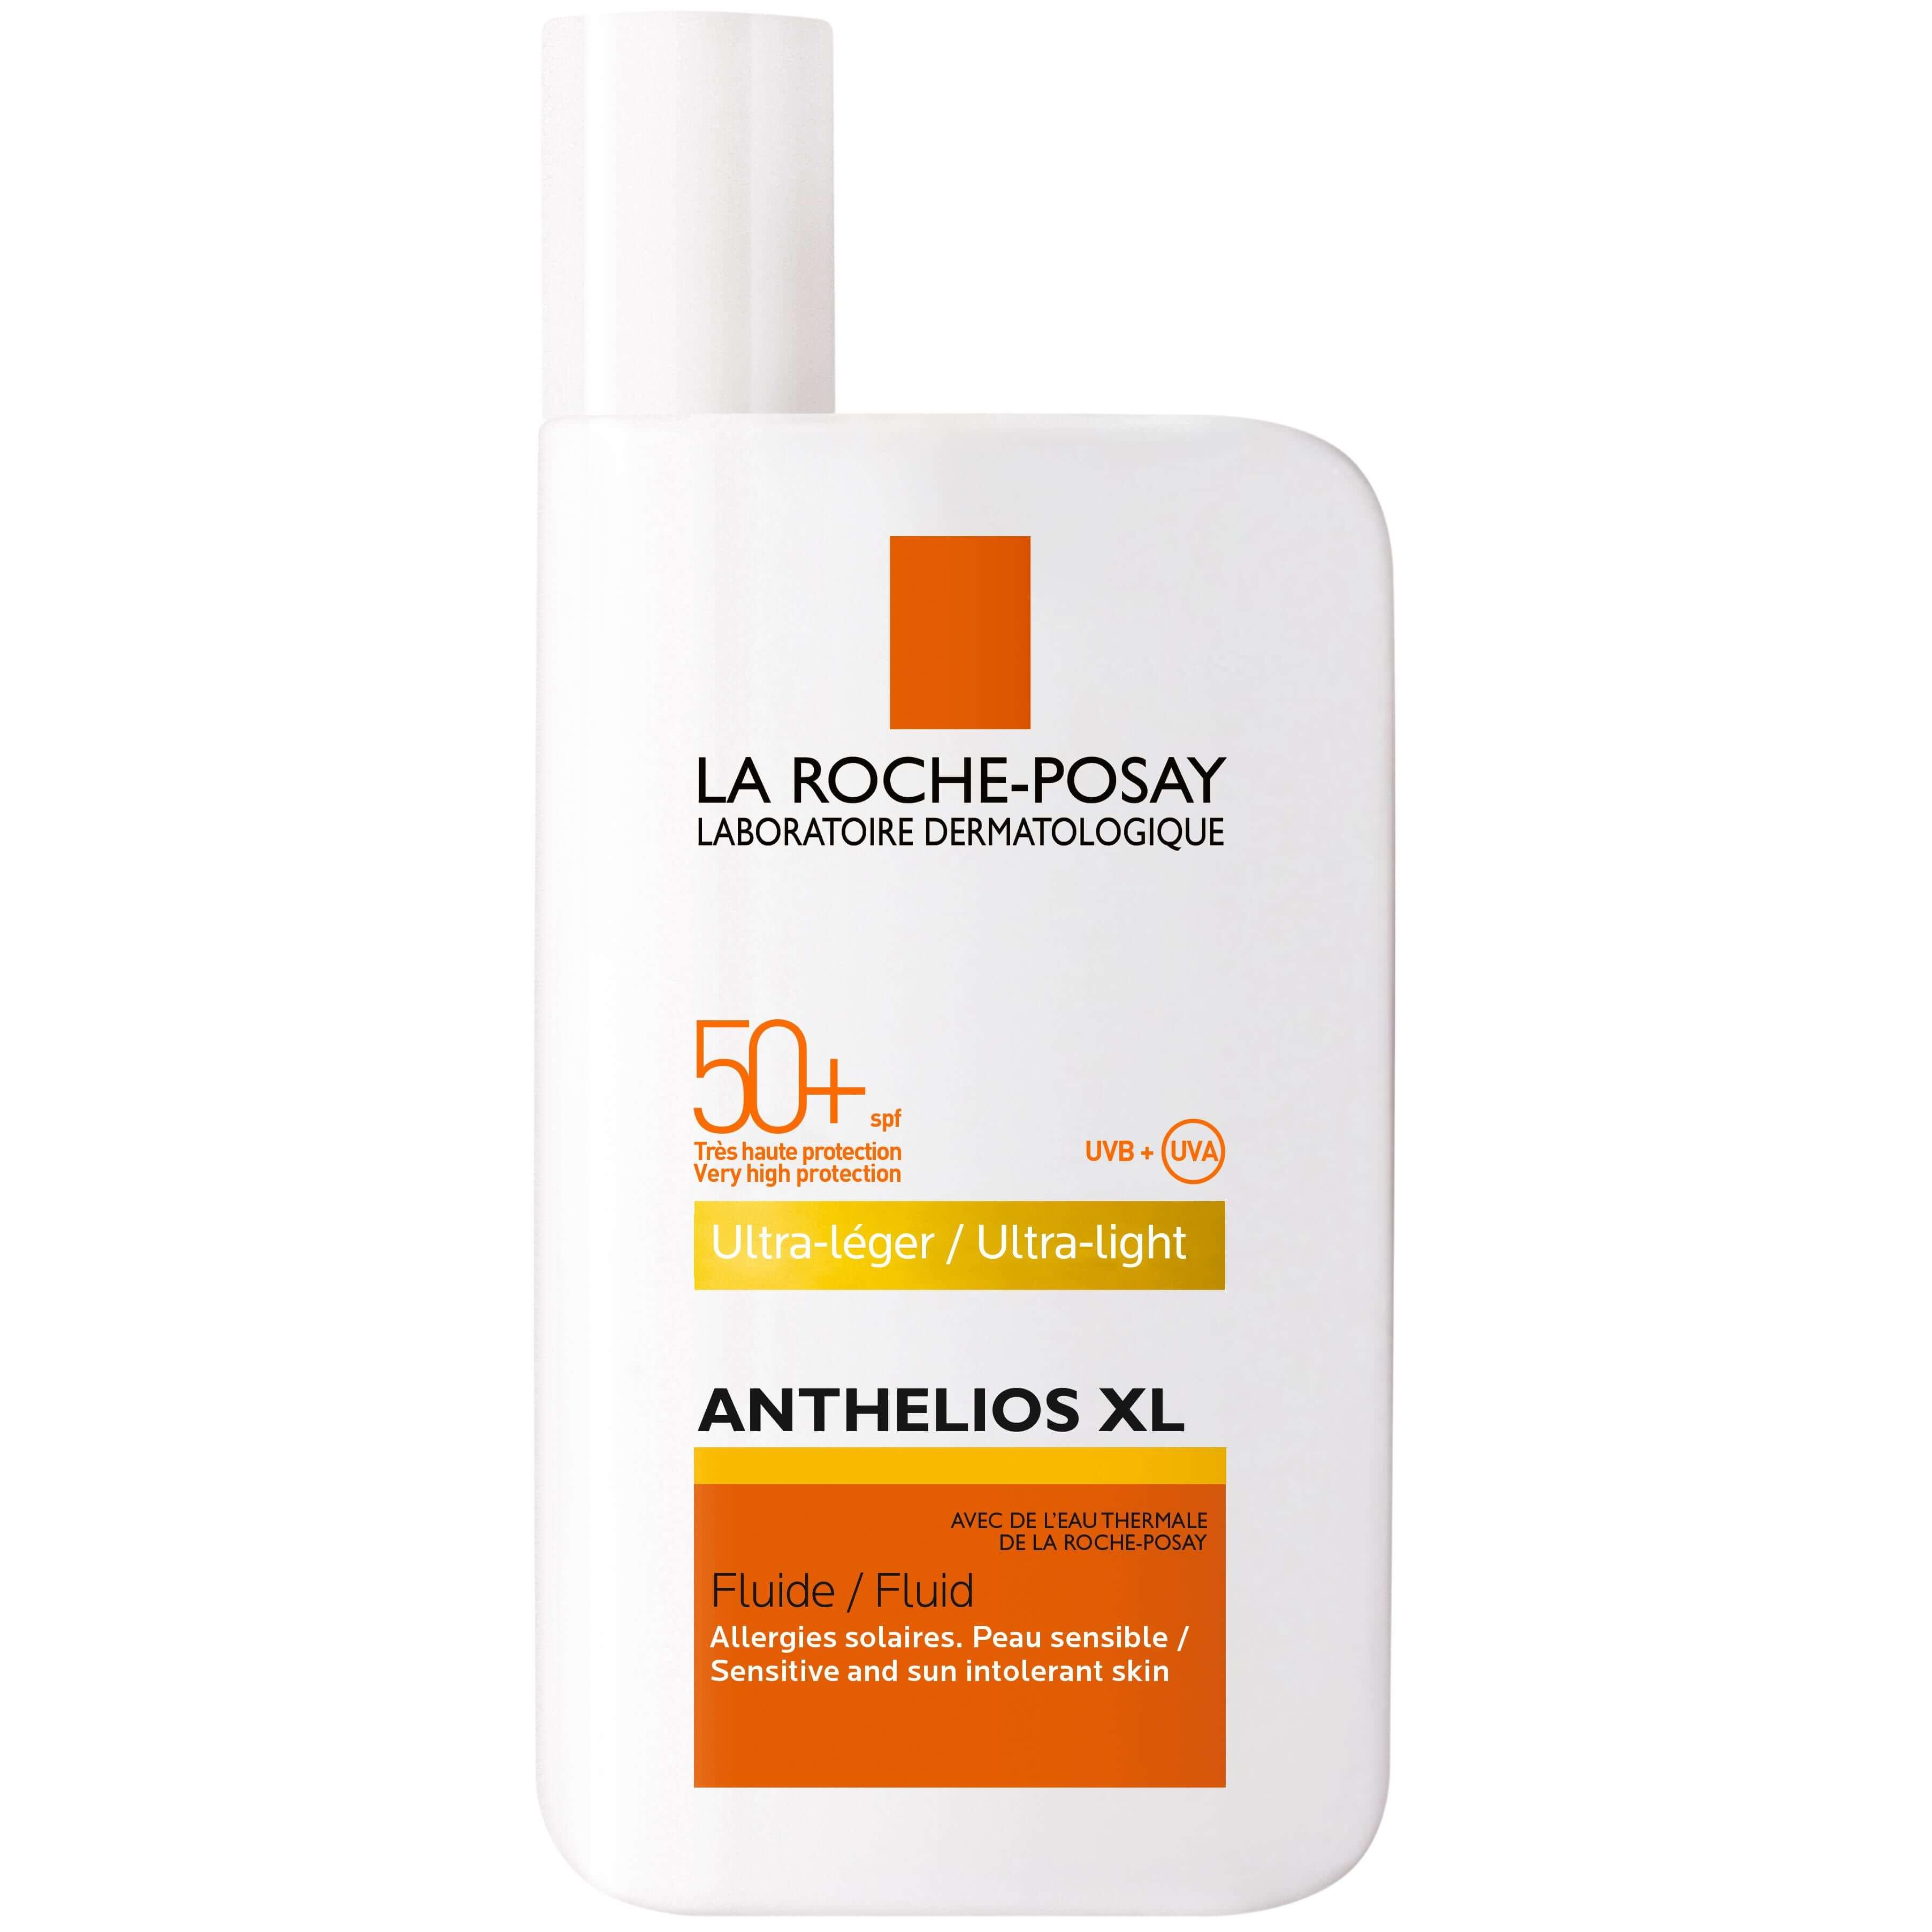 La Roche-Posay Anthelios XL Fluide Spf50+ Λεπτόρρευστη Αντηλιακή Κρέμα Προσώπου με Άρωμα 50ml